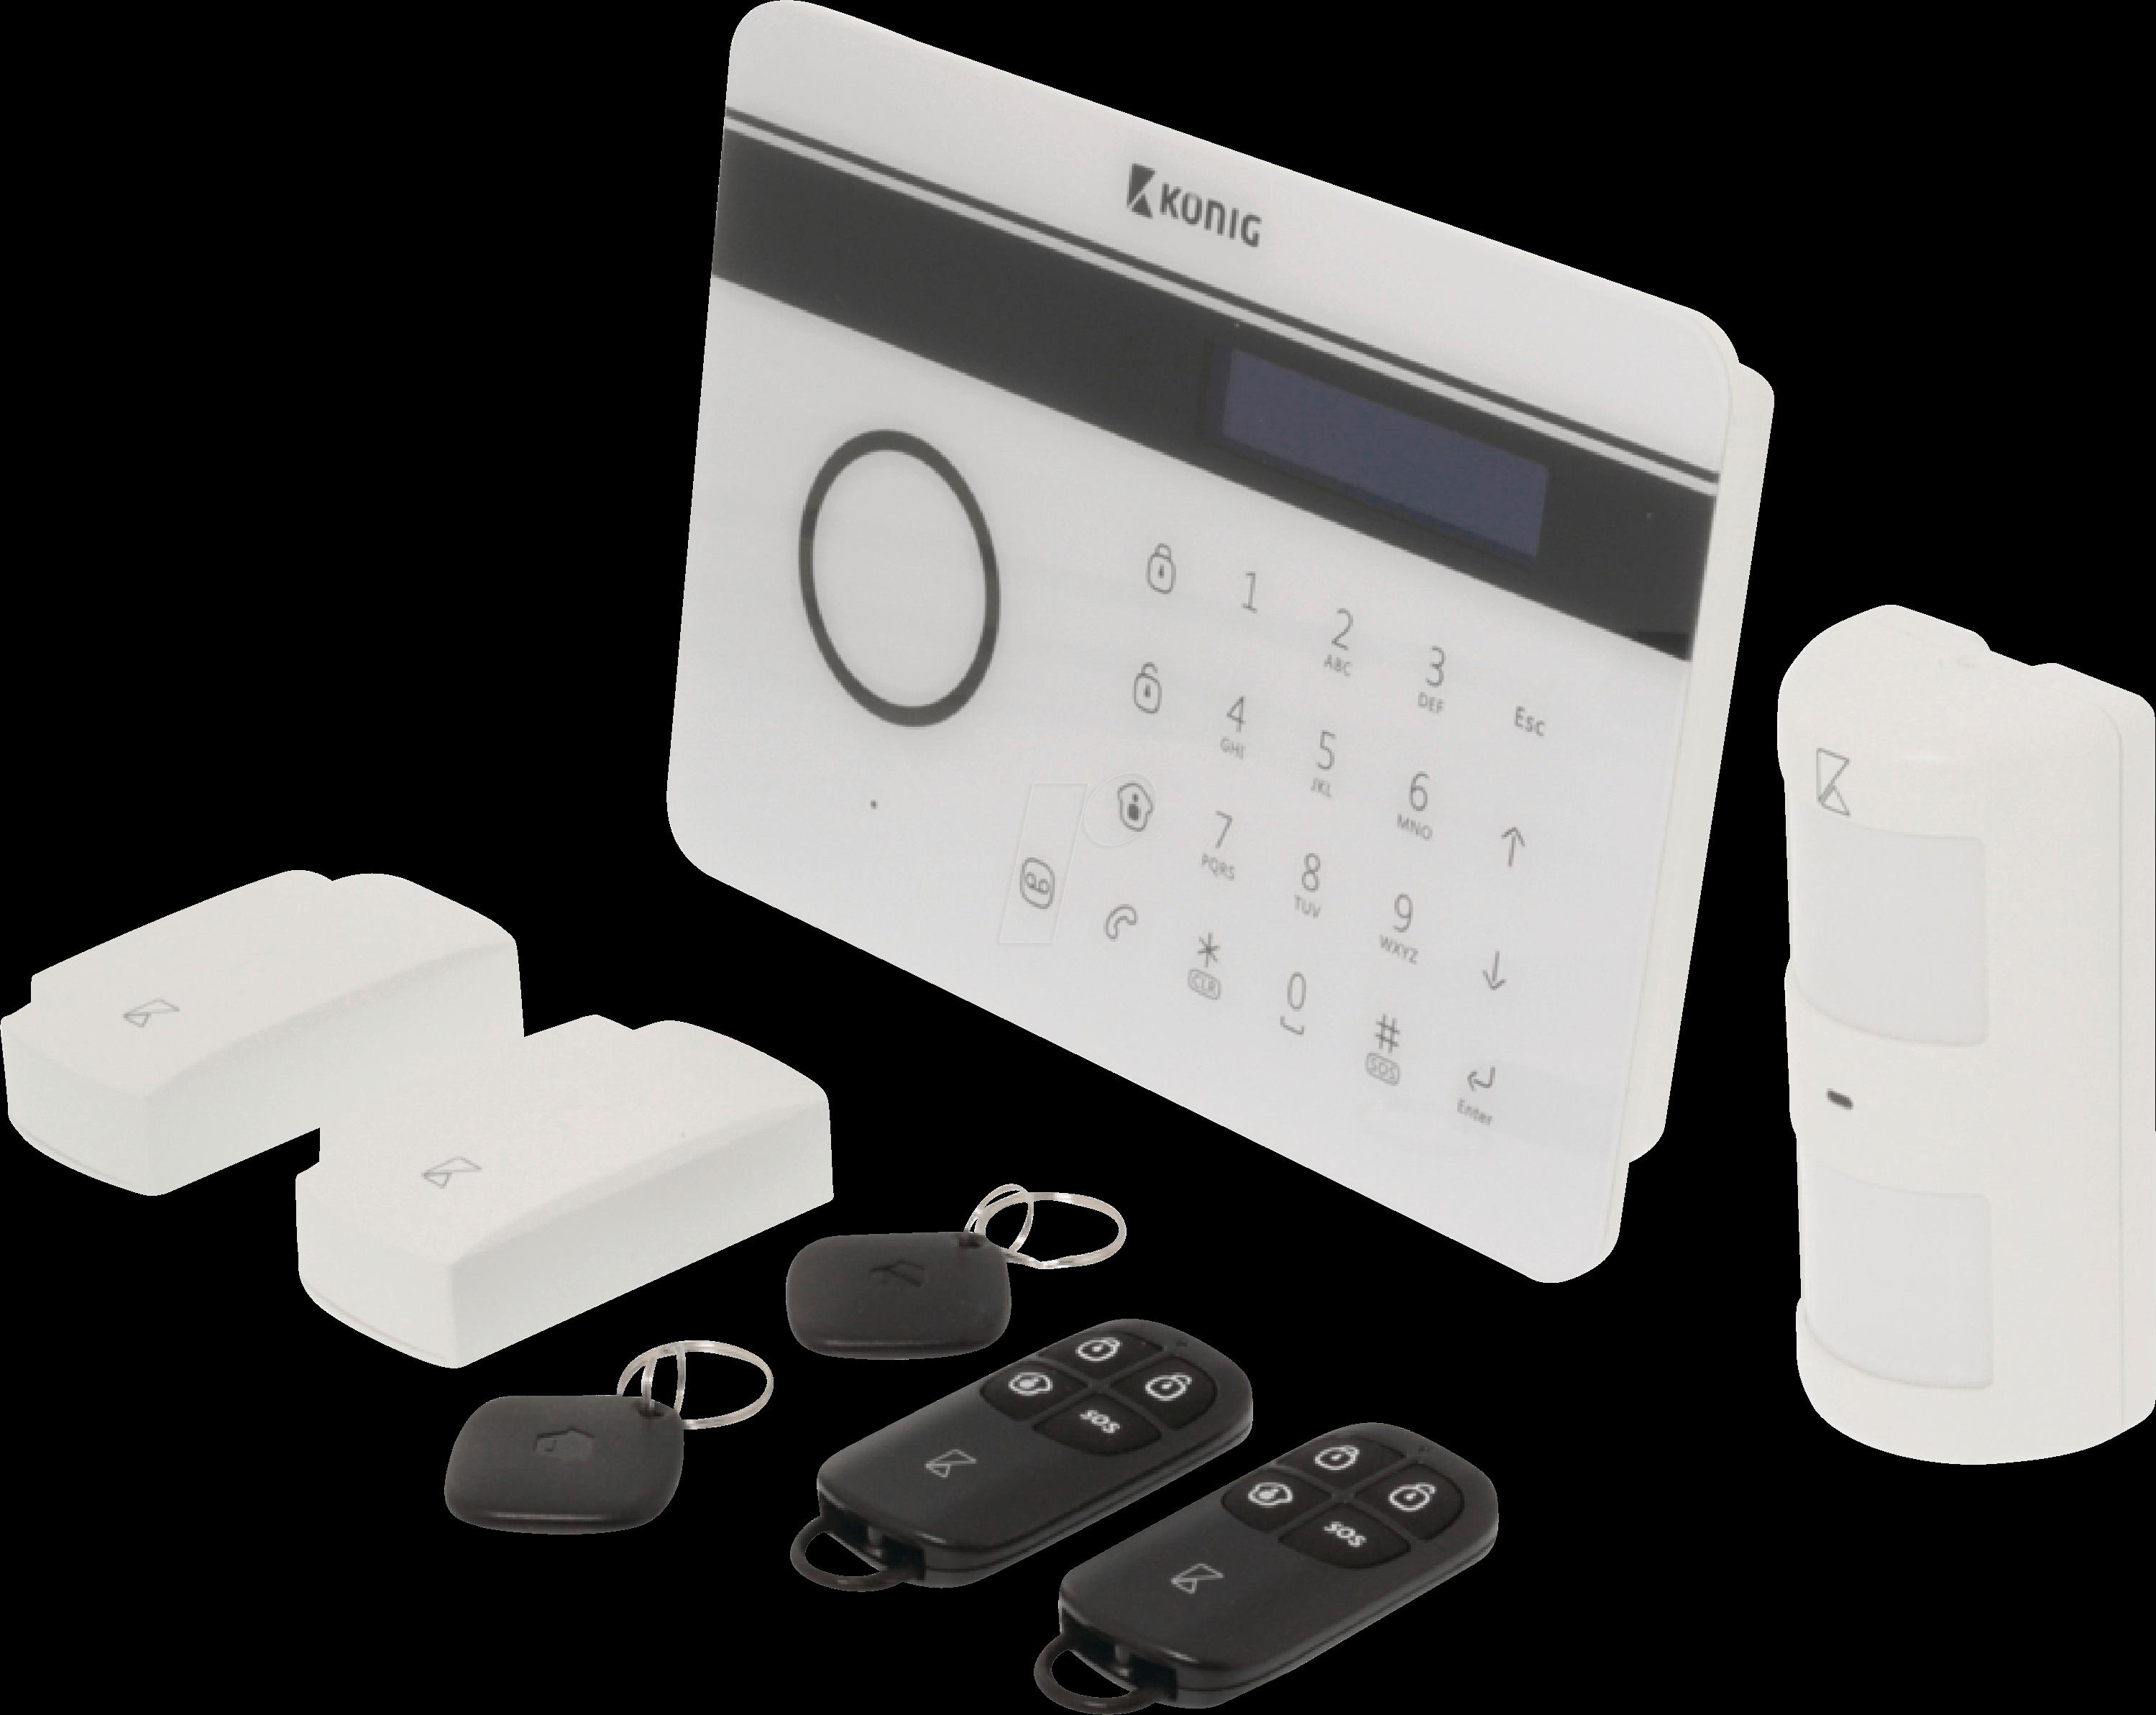 KN SAS-ALARM300: Alarmanlage, Funk 433 MHz, mit GSM Modul bei ...